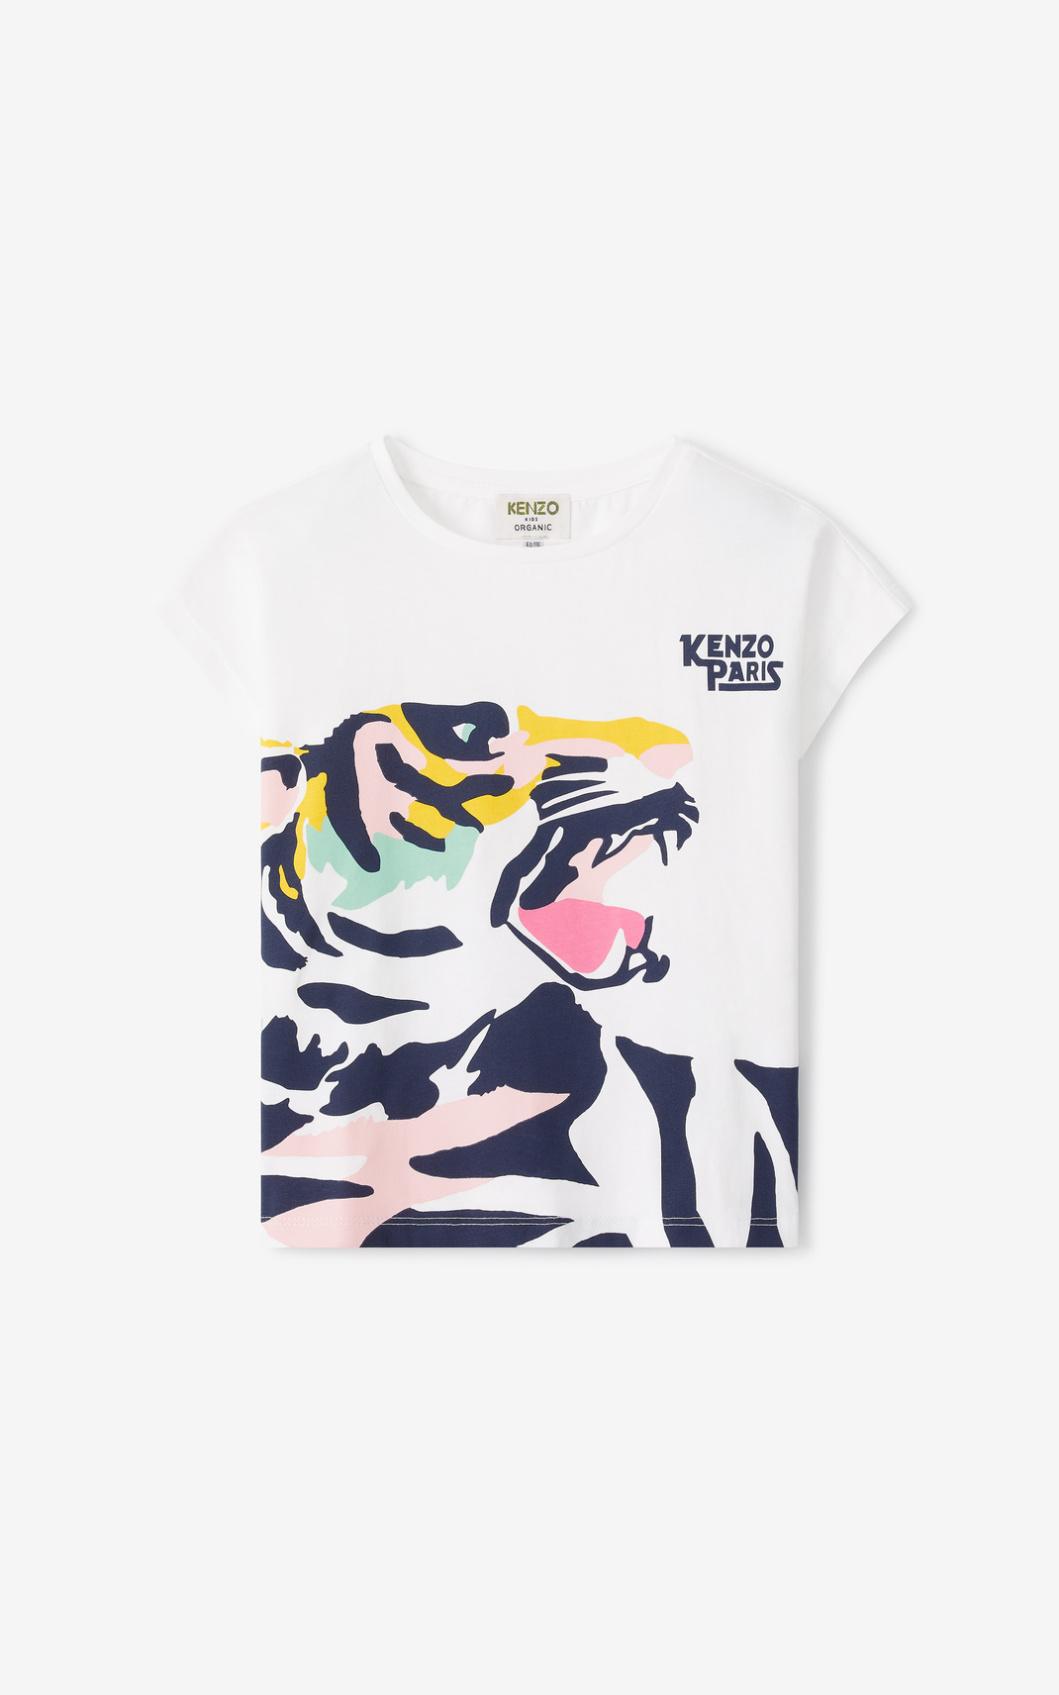 KENZO T-shirt KENZO Paris 'Ventura'